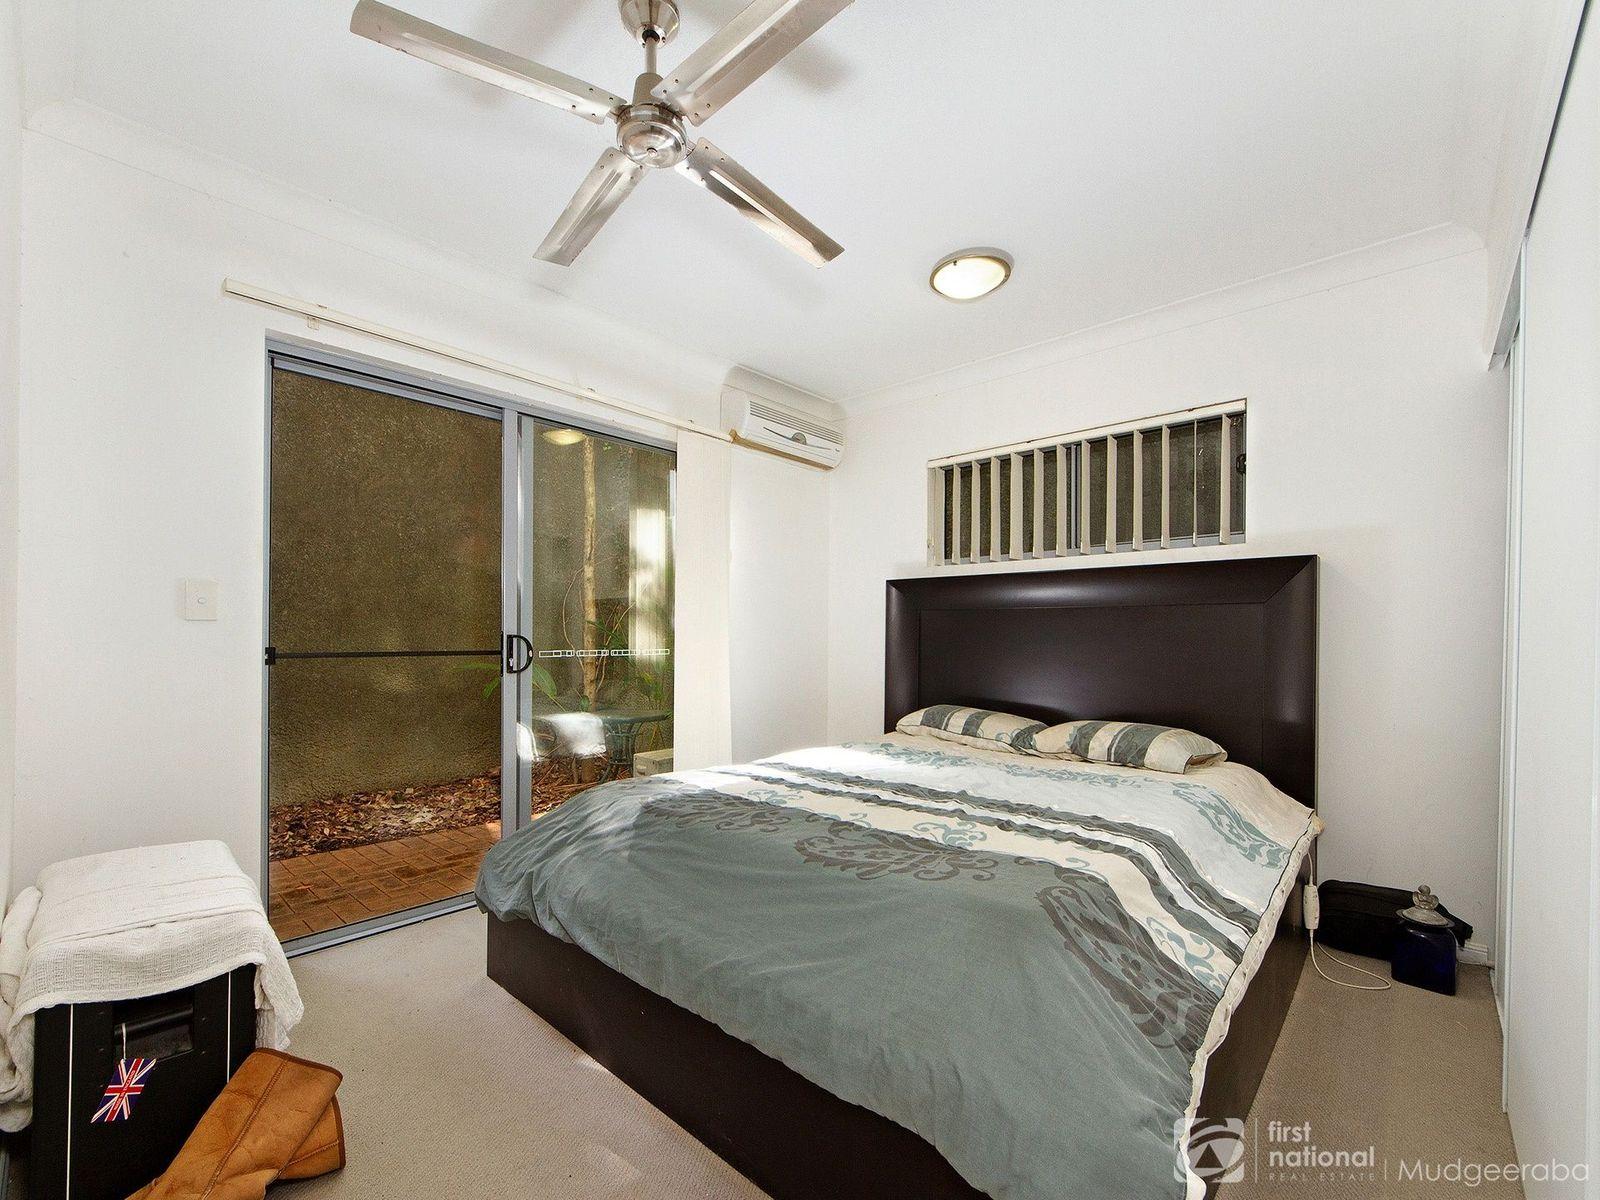 28/1 Hinterland Drive, Mudgeeraba, QLD 4213